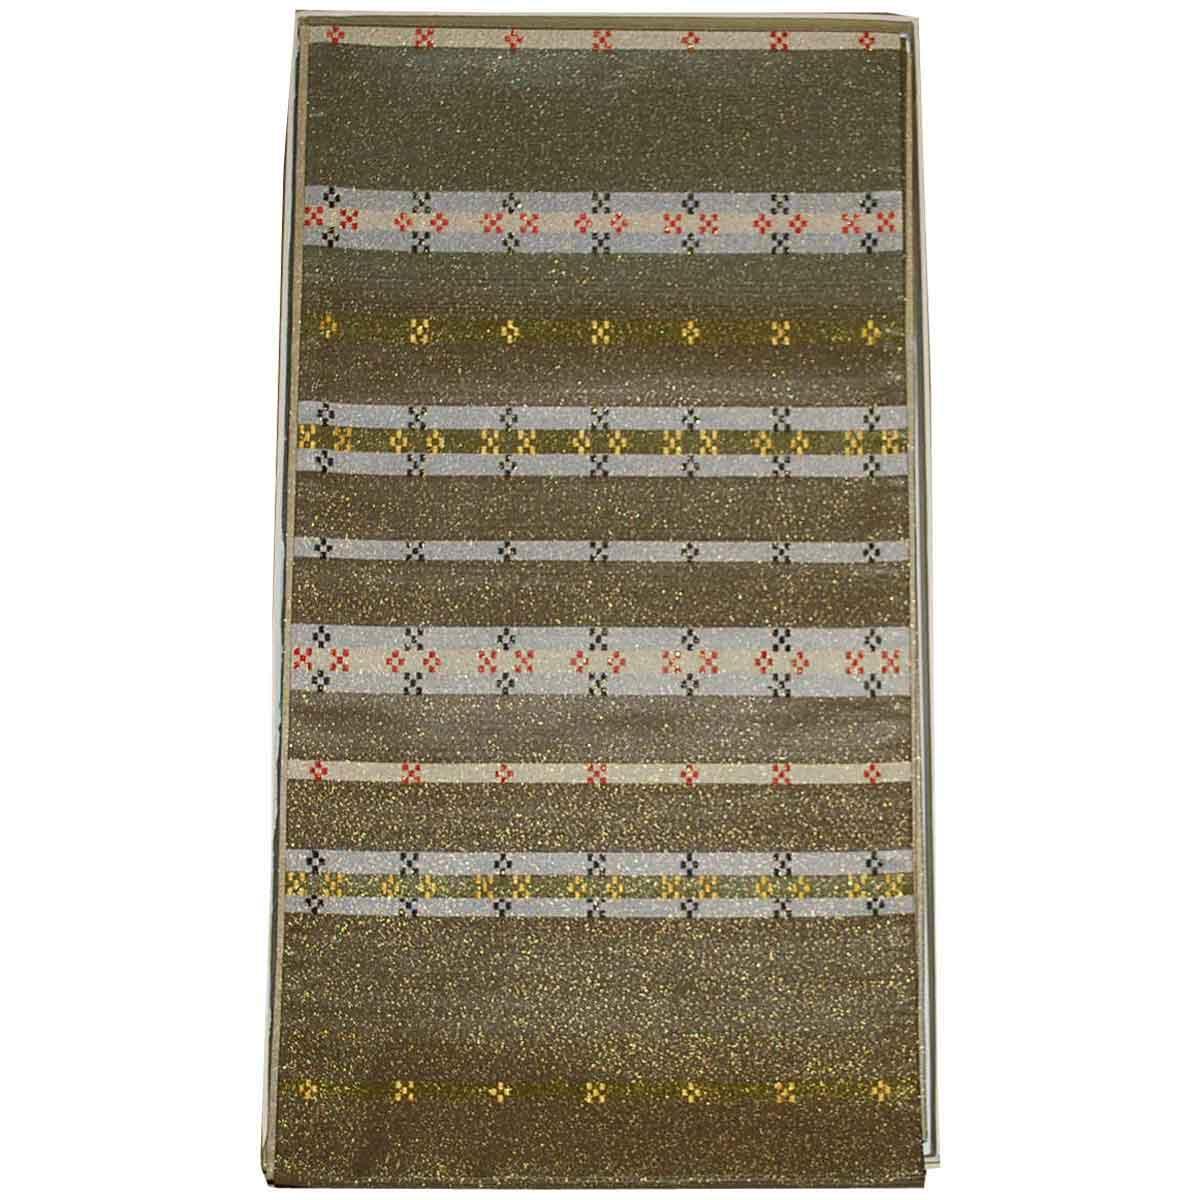 綴れ 袋帯 正絹